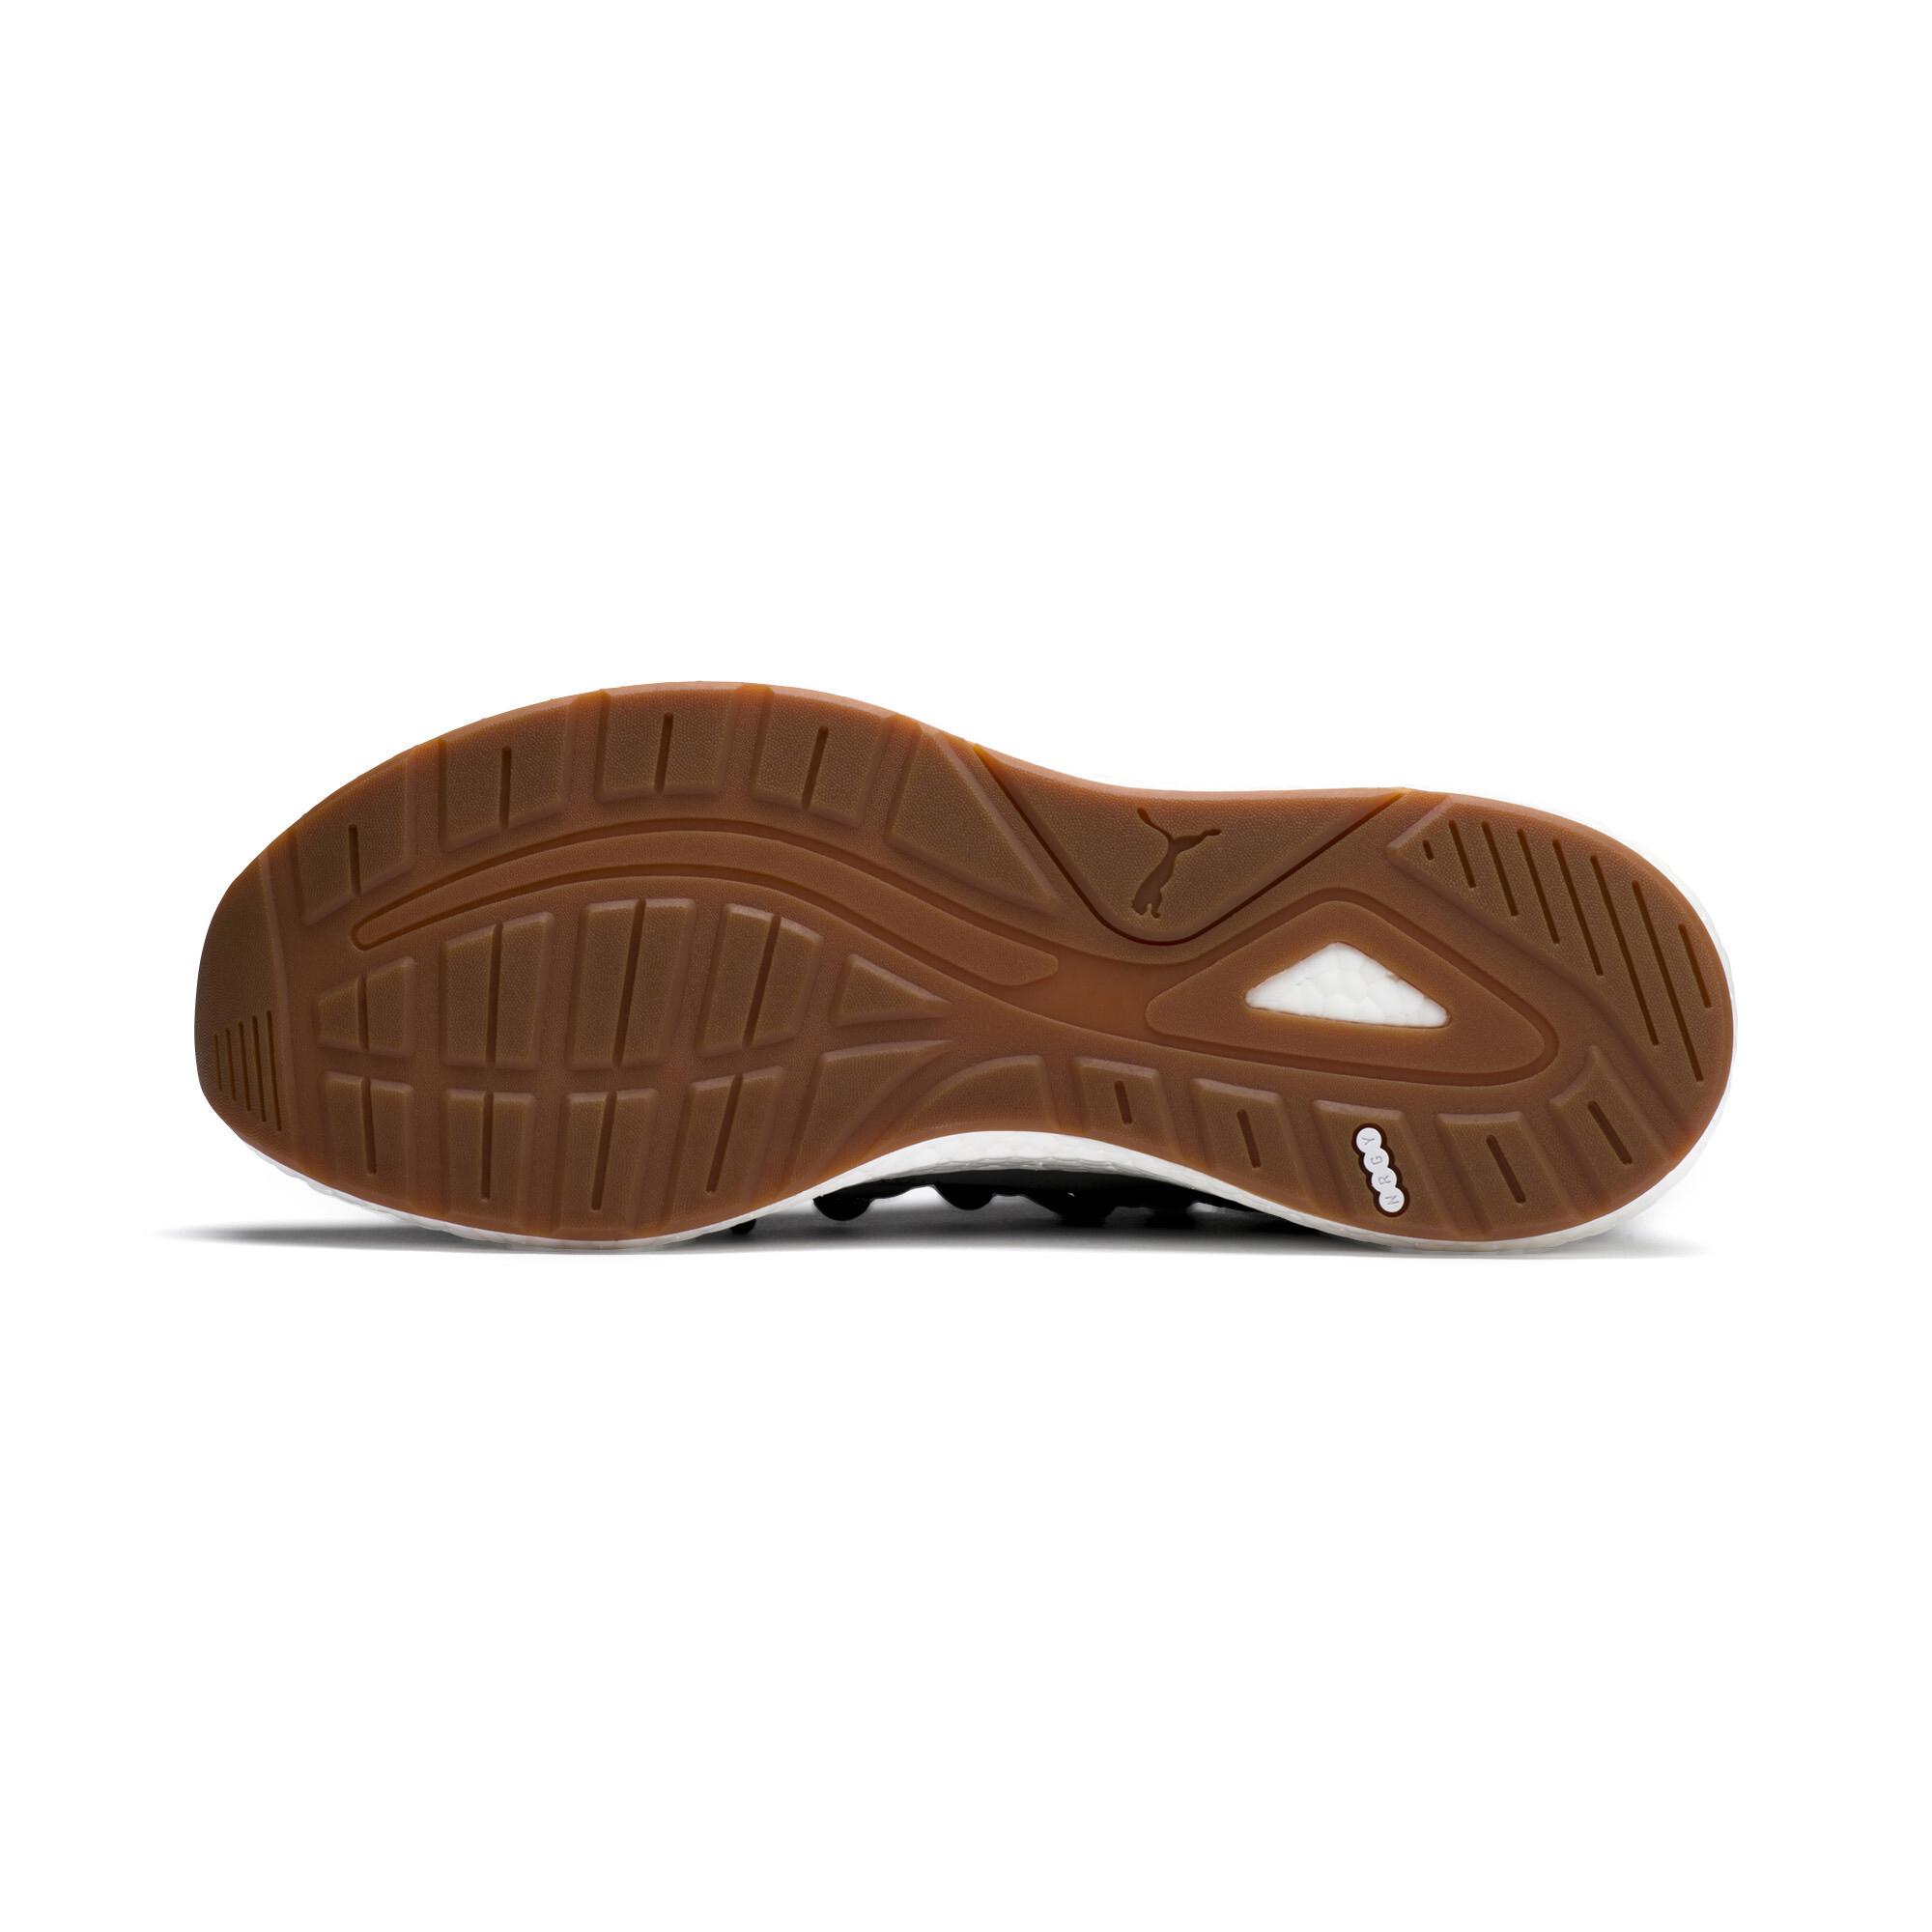 PUMA-NRGY-Neko-Future-Men-s-Running-Shoes-Men-Shoe-Running thumbnail 11